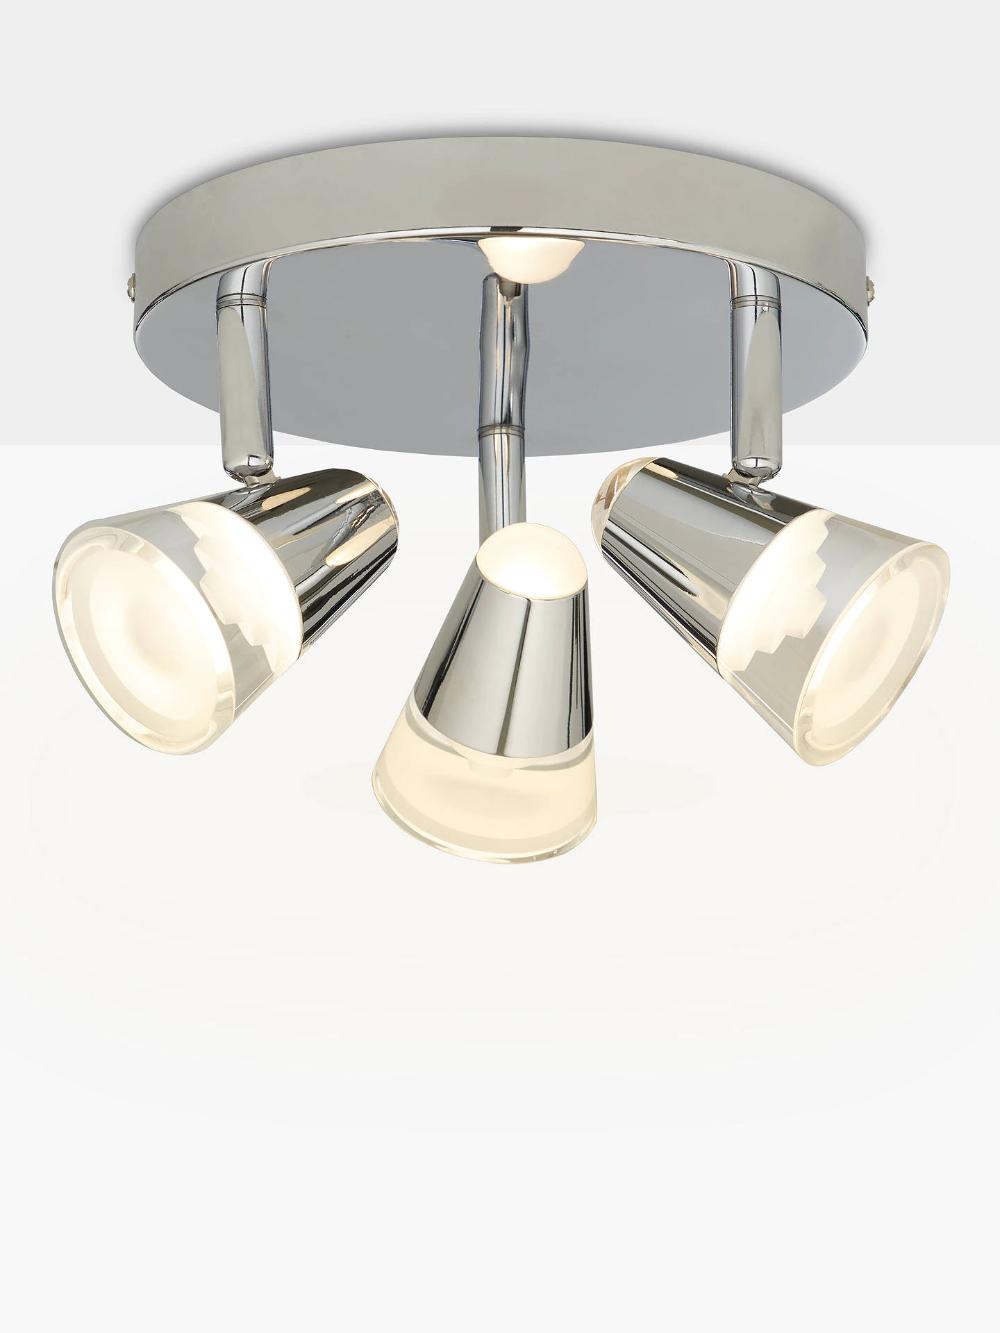 John Lewis Partners Polaris Led 3 Spotlight Bathroom Ceiling Plate Chrome Bathroom Light Fittings Bathroom Ceiling Bathroom Lighting